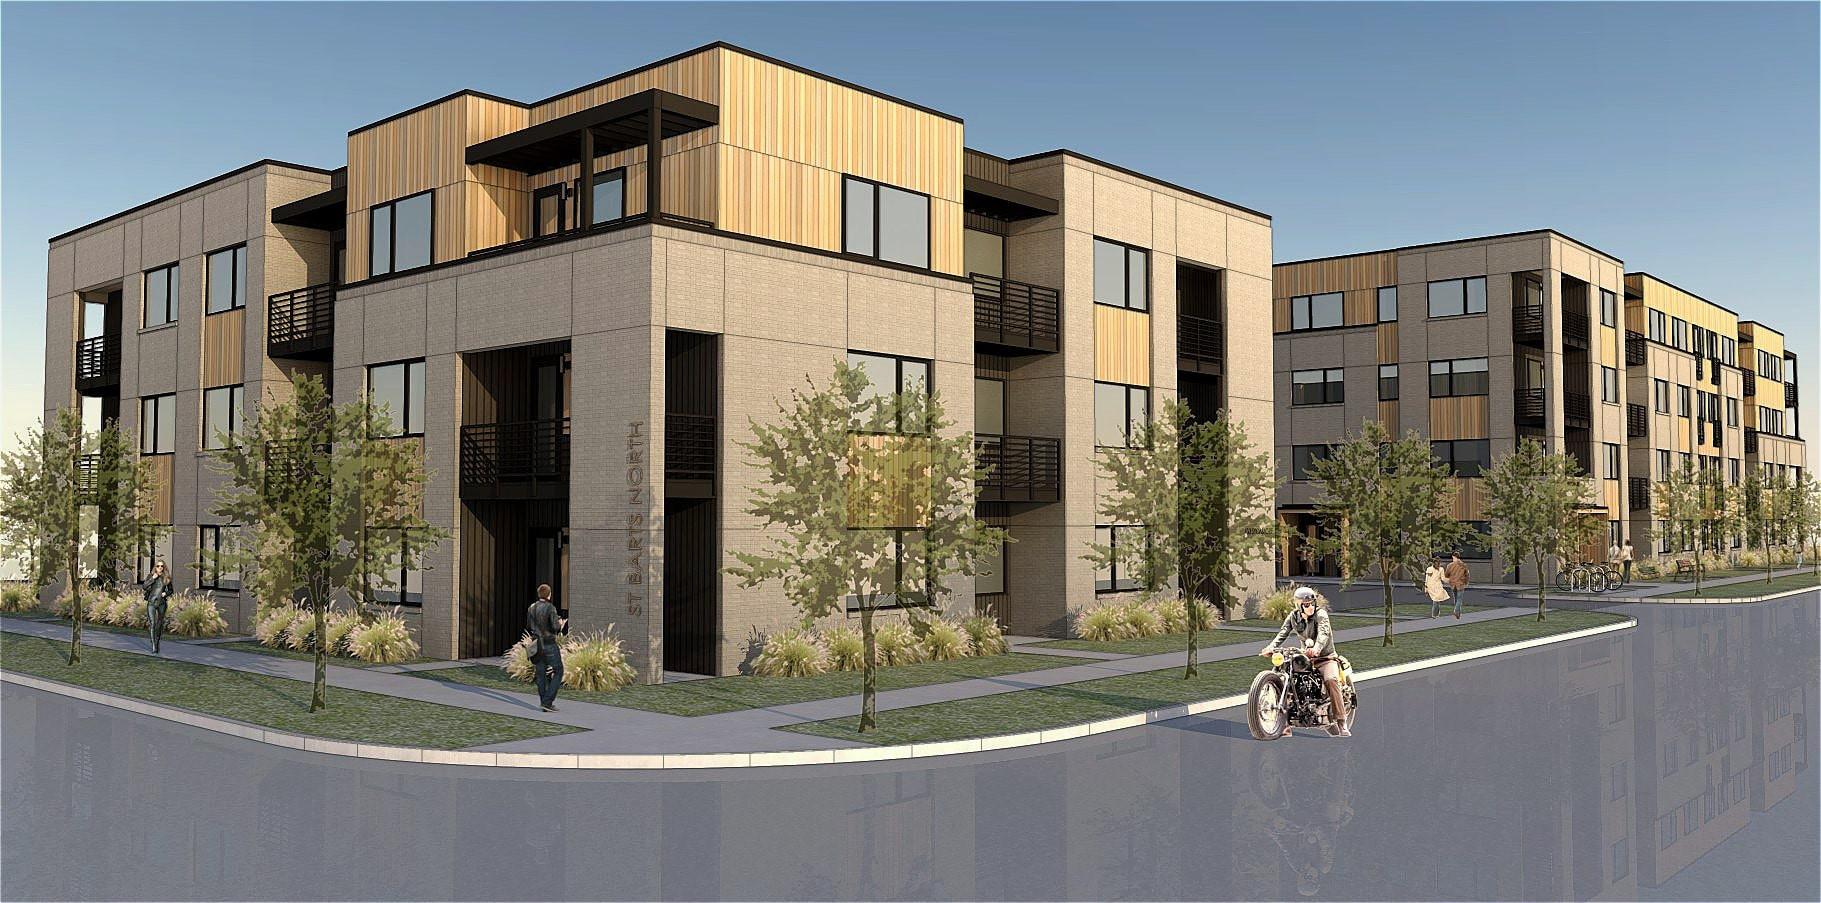 COLUMBUS APARTMENTS NW STREET 20201029-m